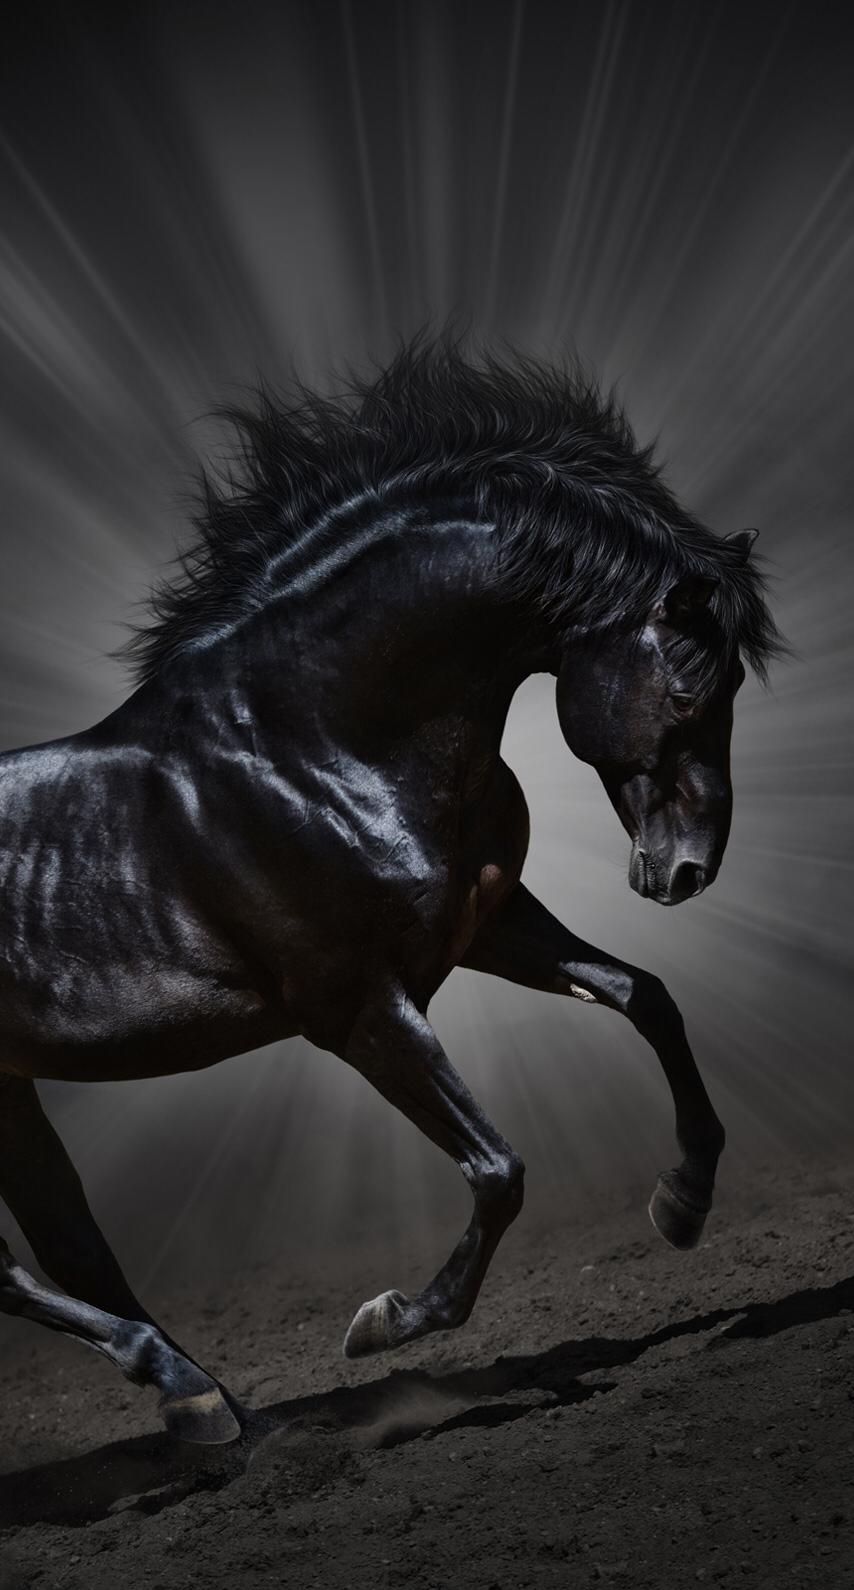 Black Phantom Wallpaper Luxurydotcom Horses Black Horses Pretty Horses